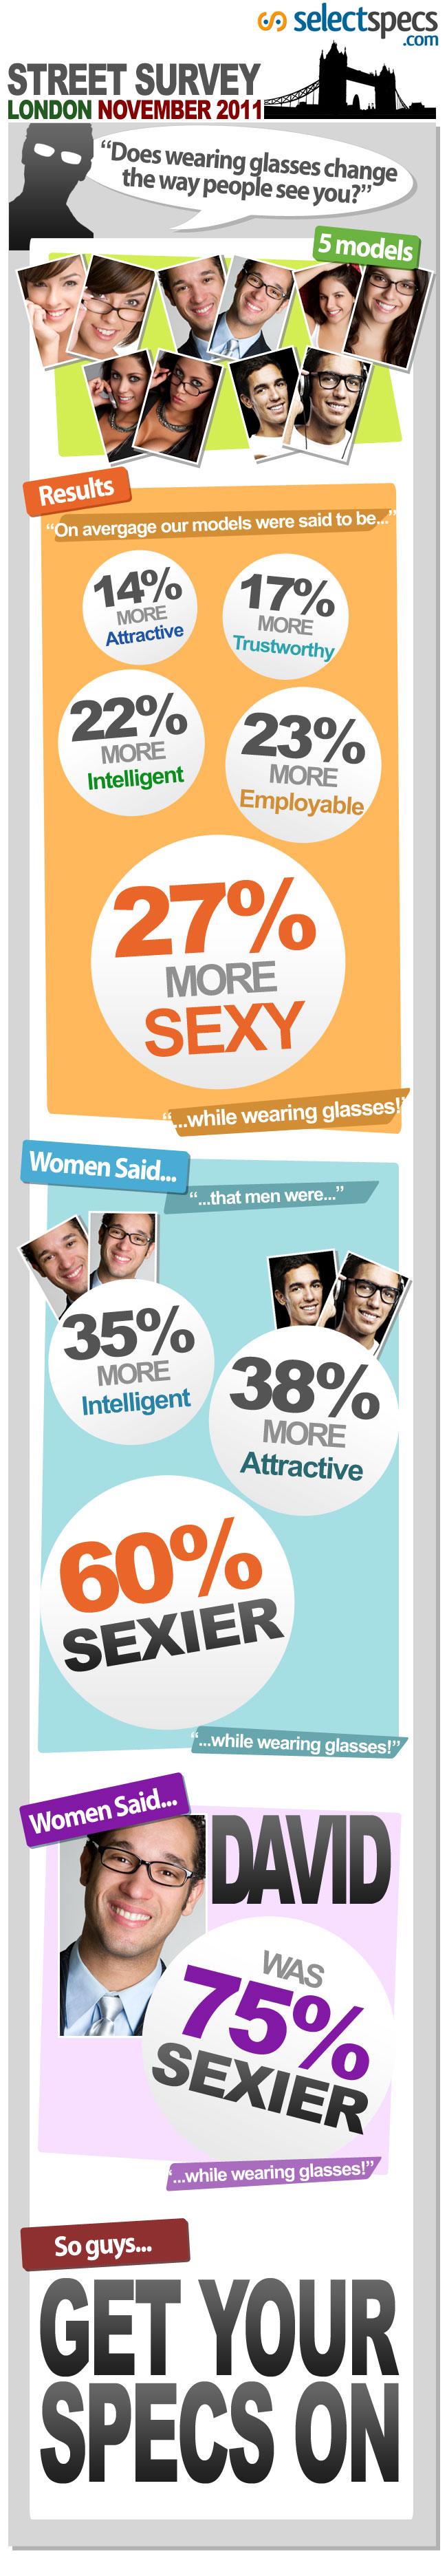 SelectSpecs Street Survey Infographic